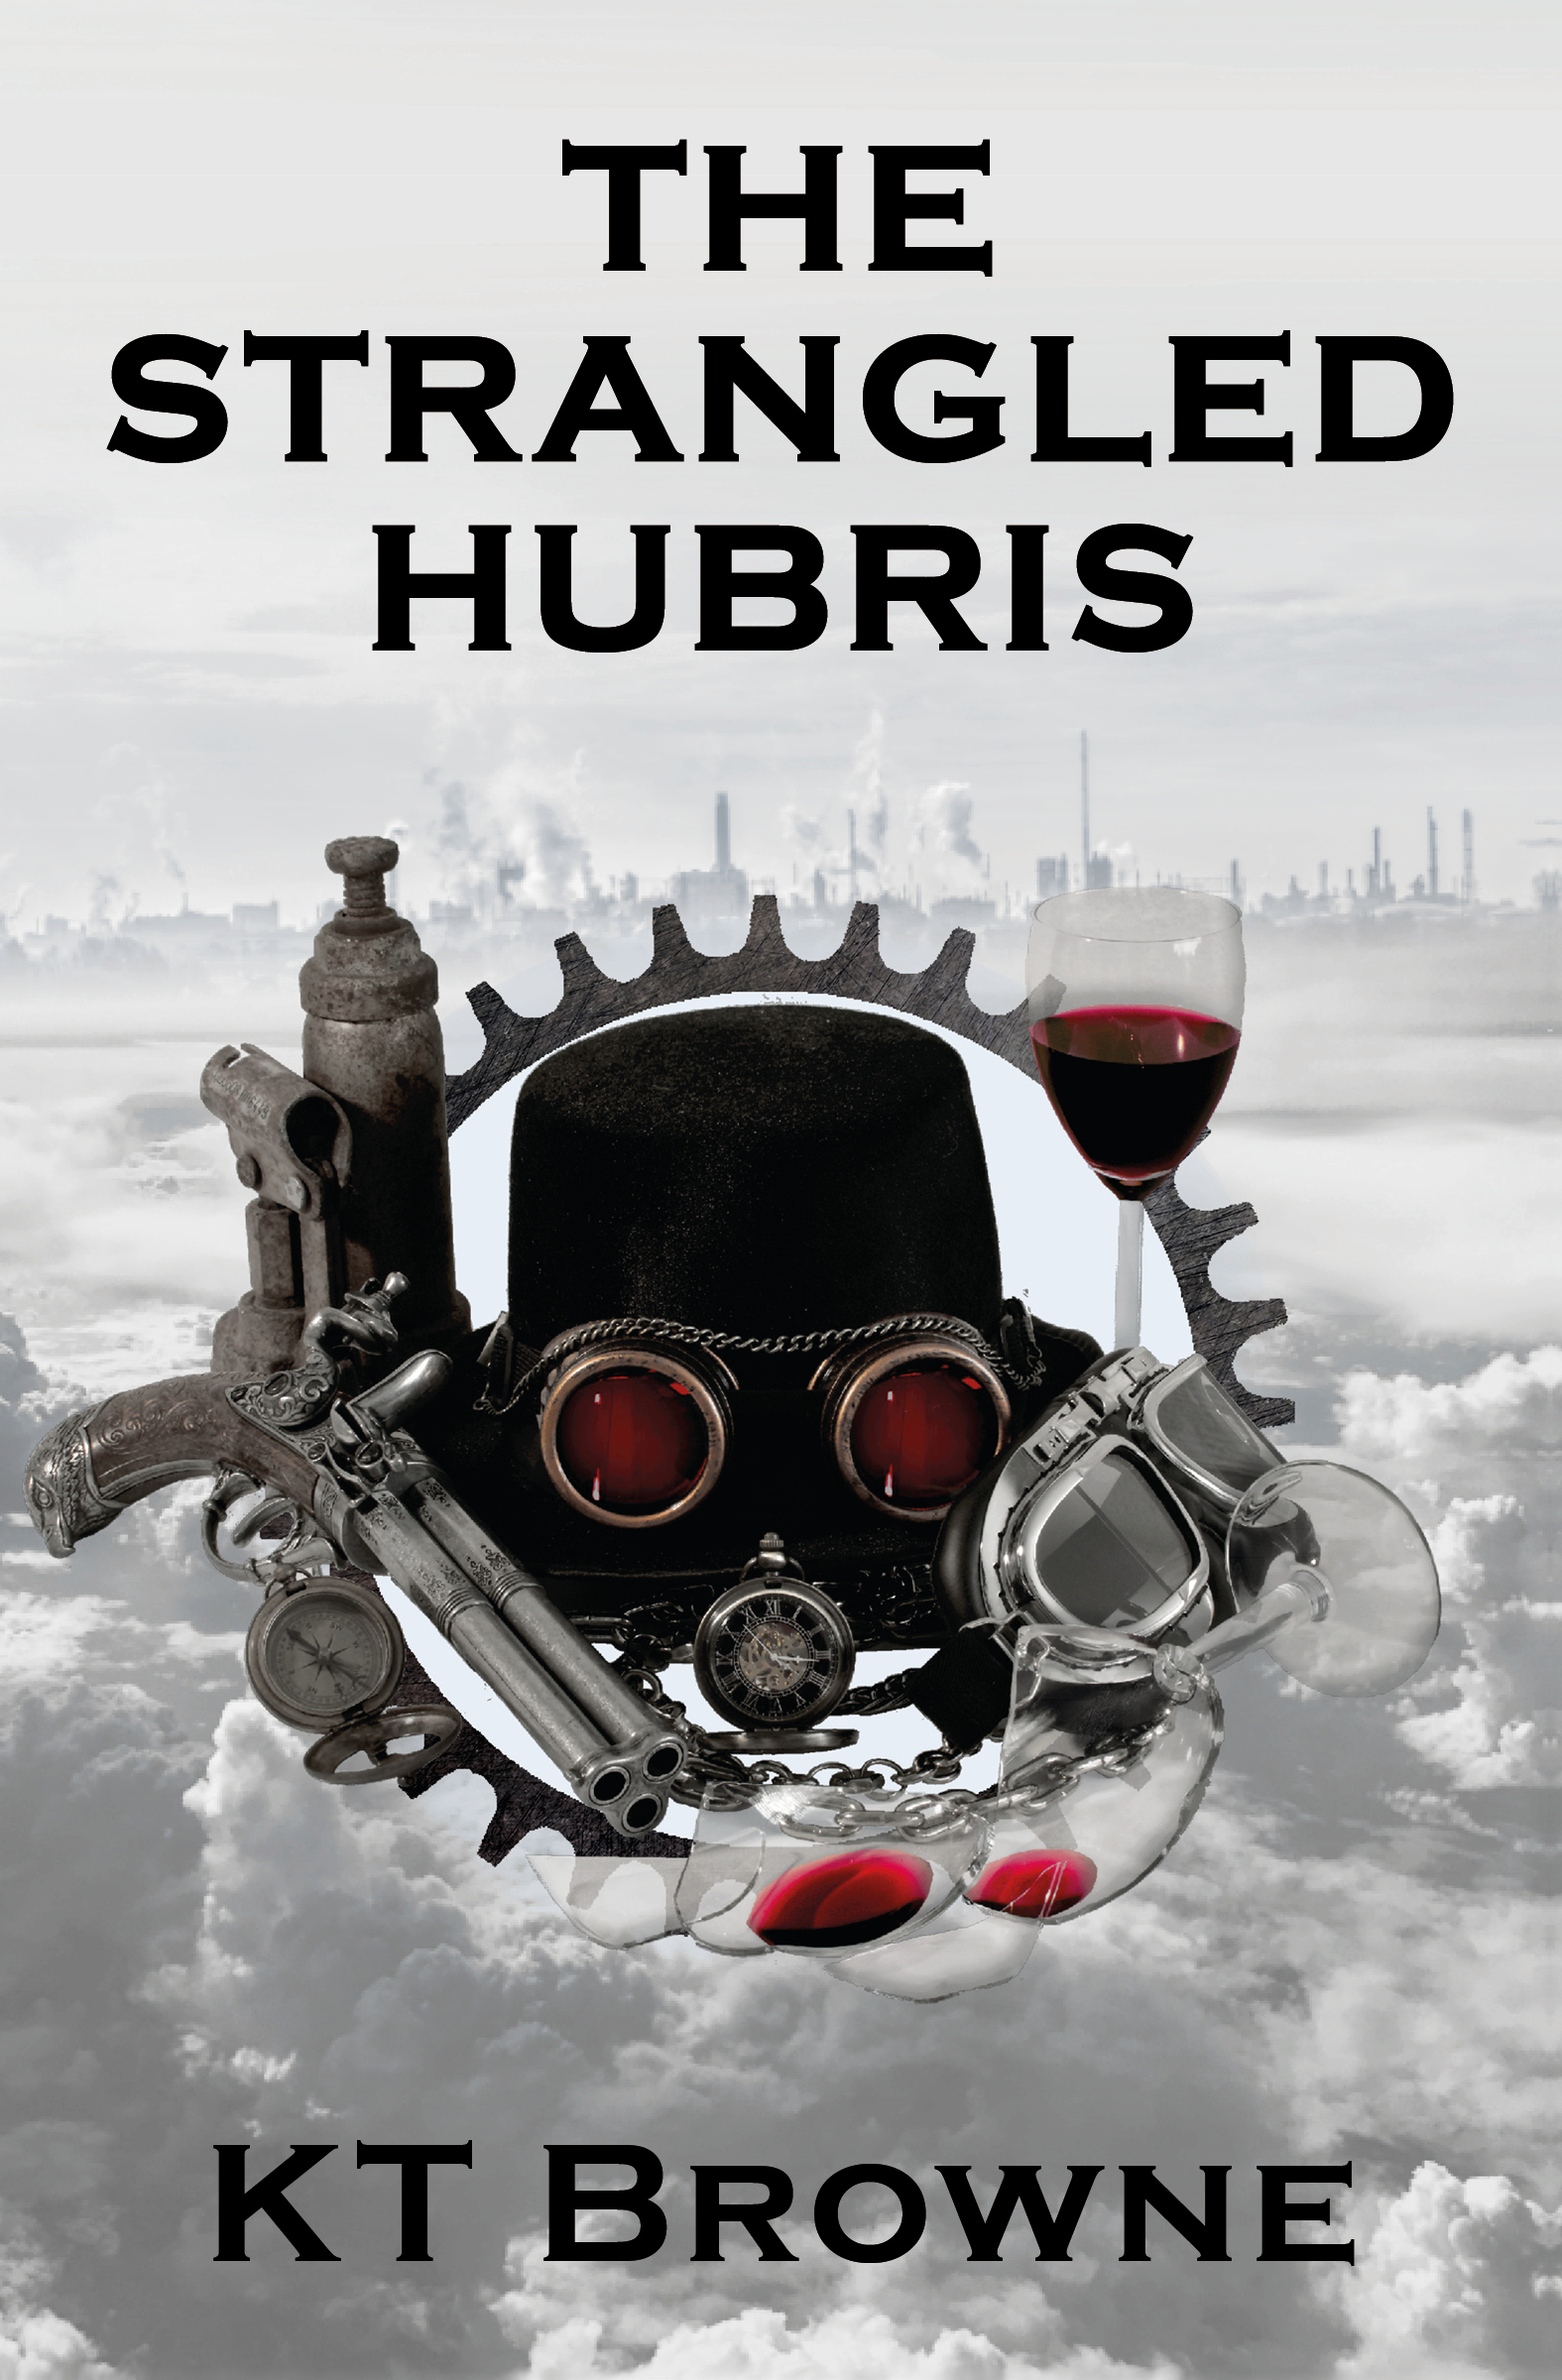 Strangled Hurbis